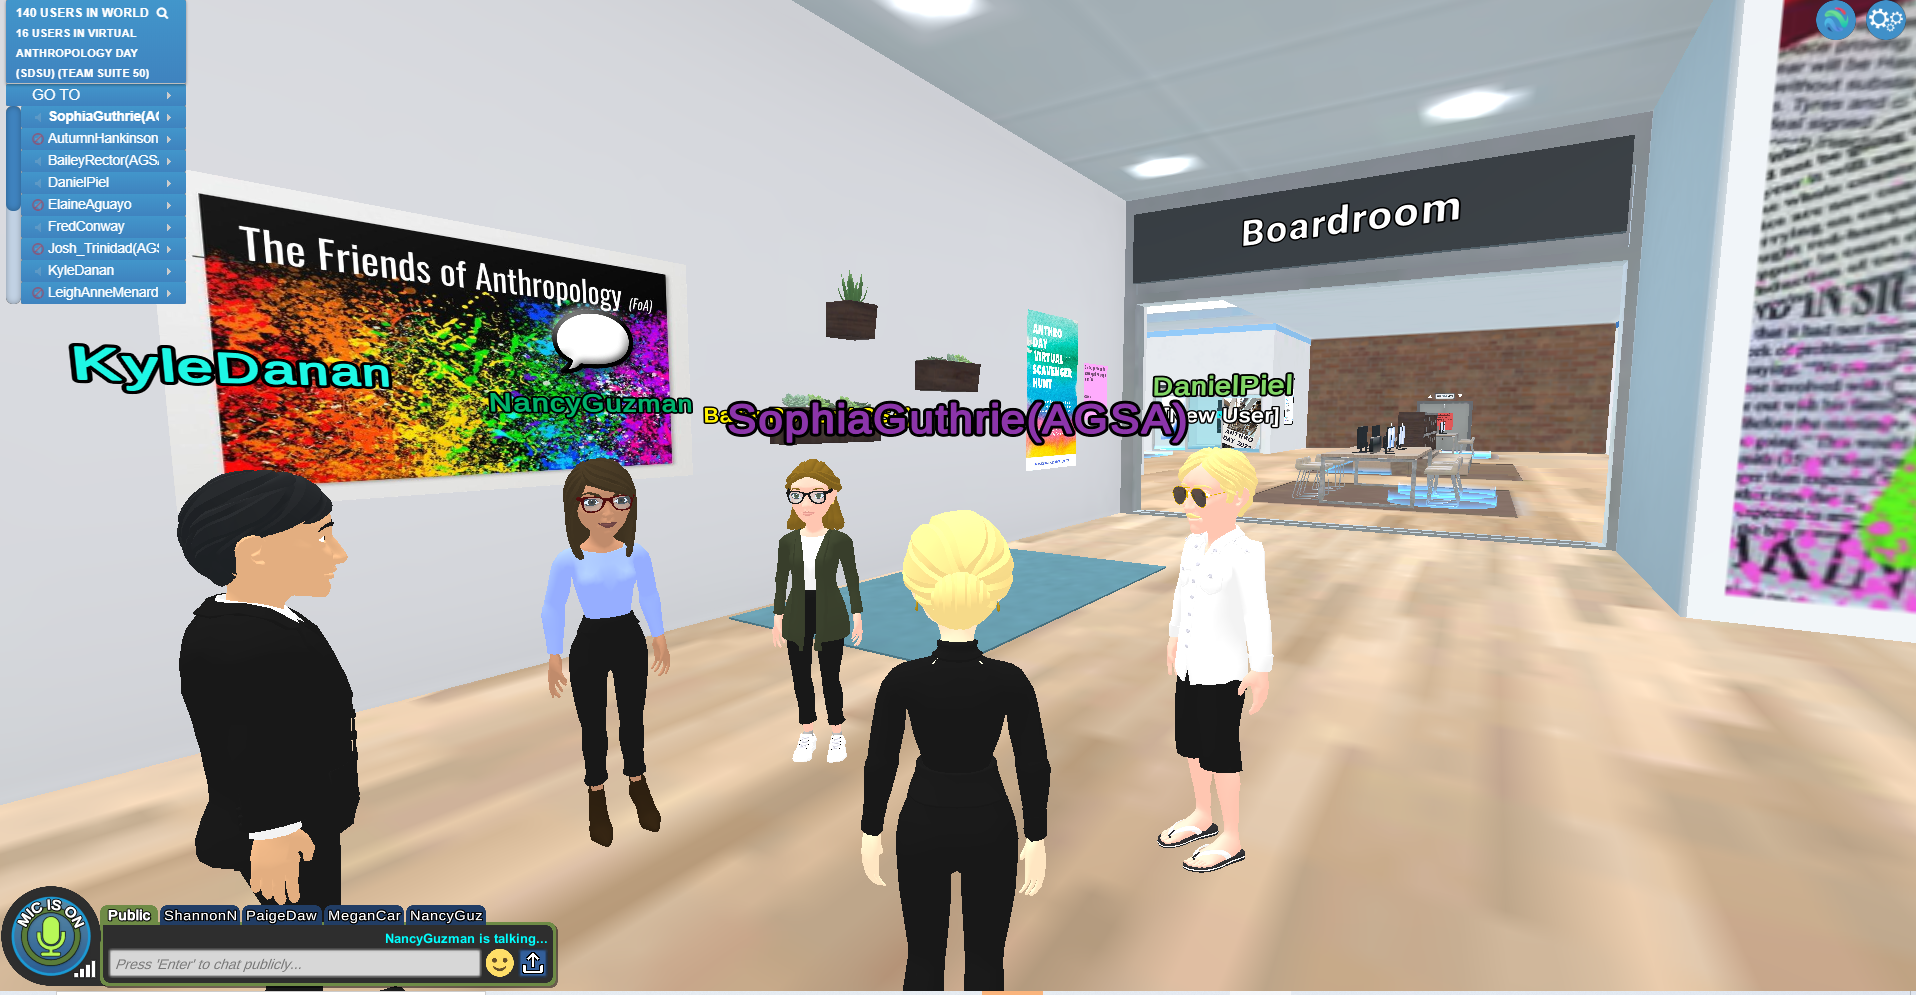 Screenshot of a virtual space including various human-shaped avatars